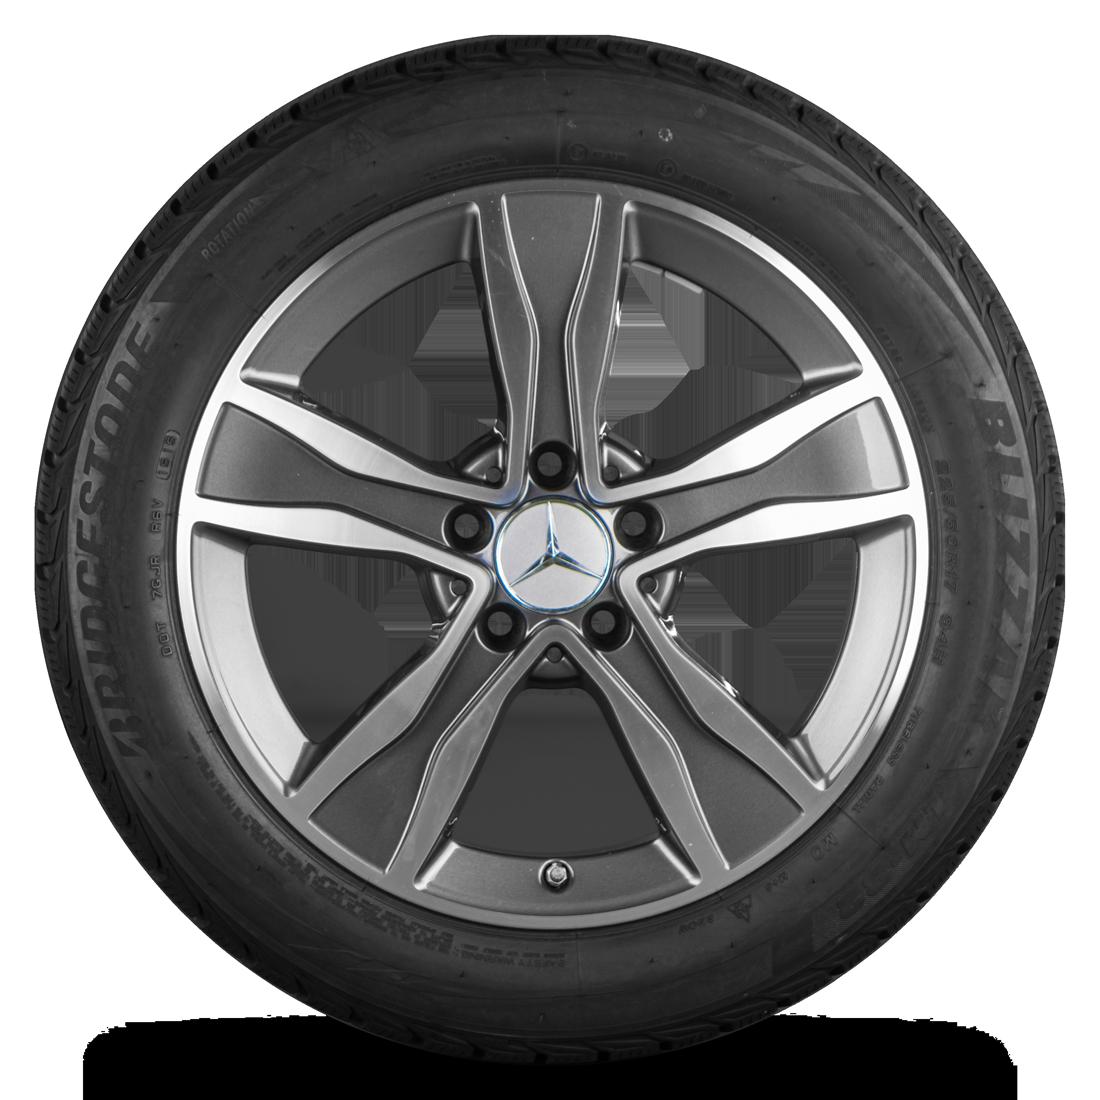 Mercedes 17 Zoll Felgen C-Klasse W205 A205 C205 S205 MO Winterreifen Winterräder